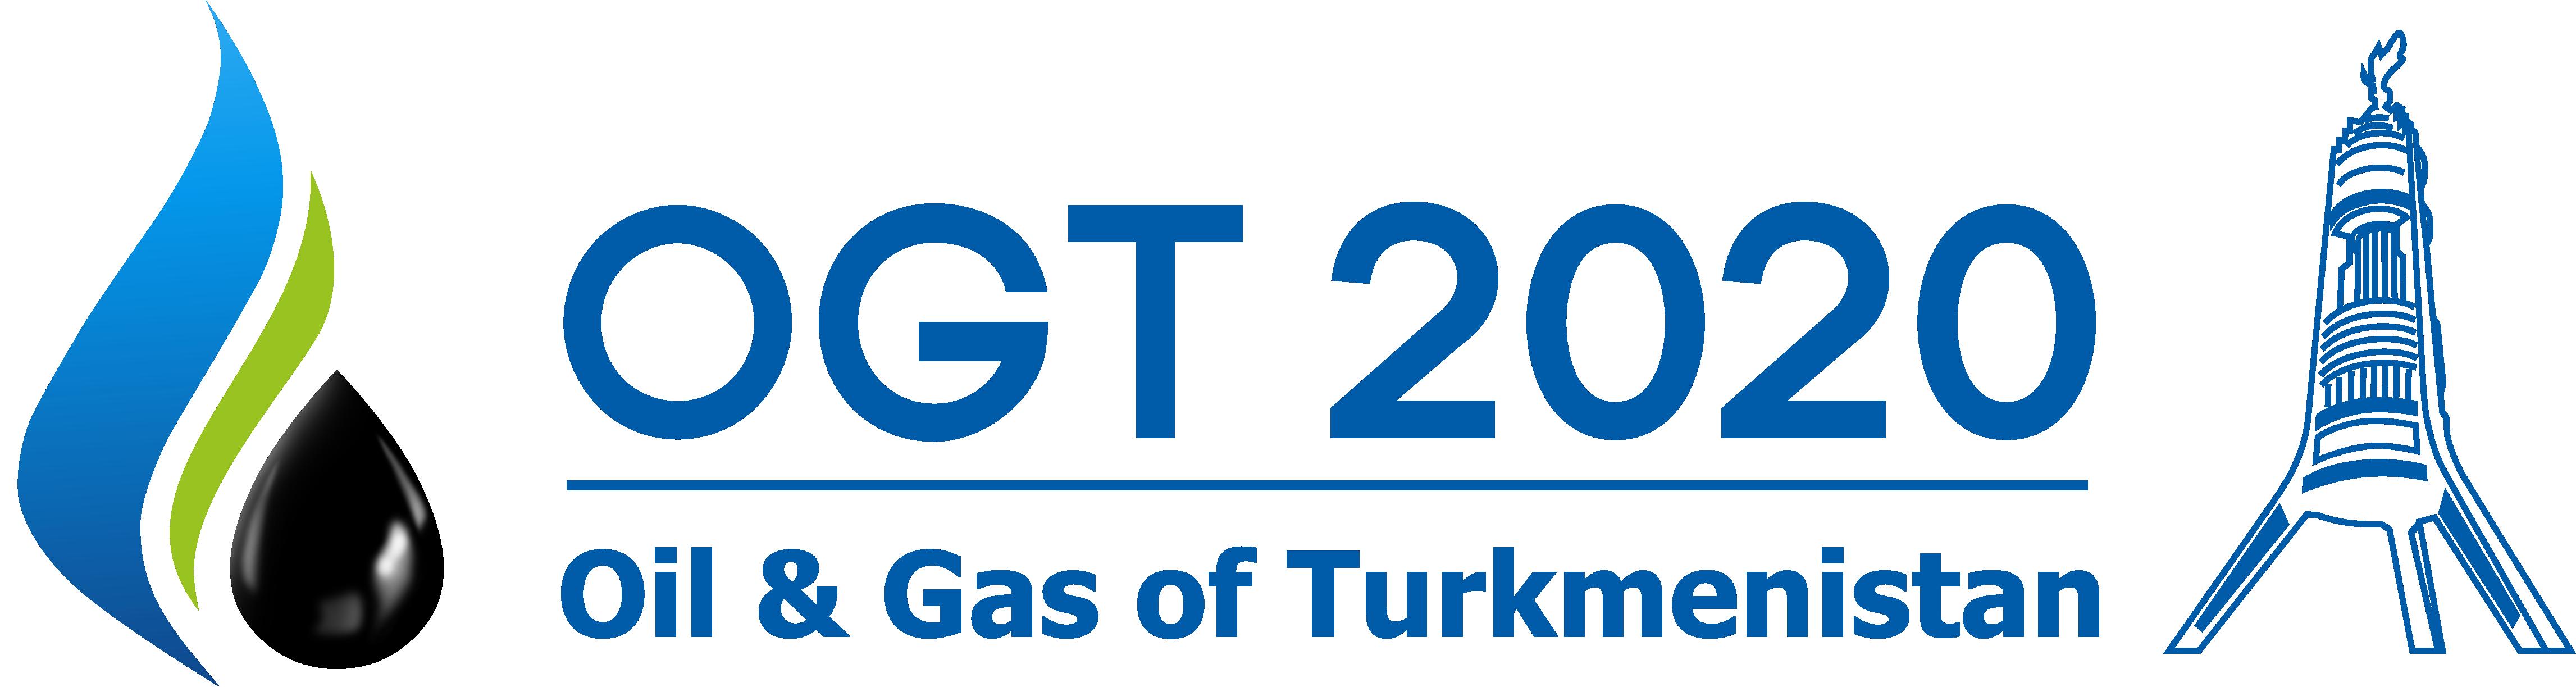 https://www.oilgas.gov.tm/storage/posts/902/original-15f8944b41c99f.png